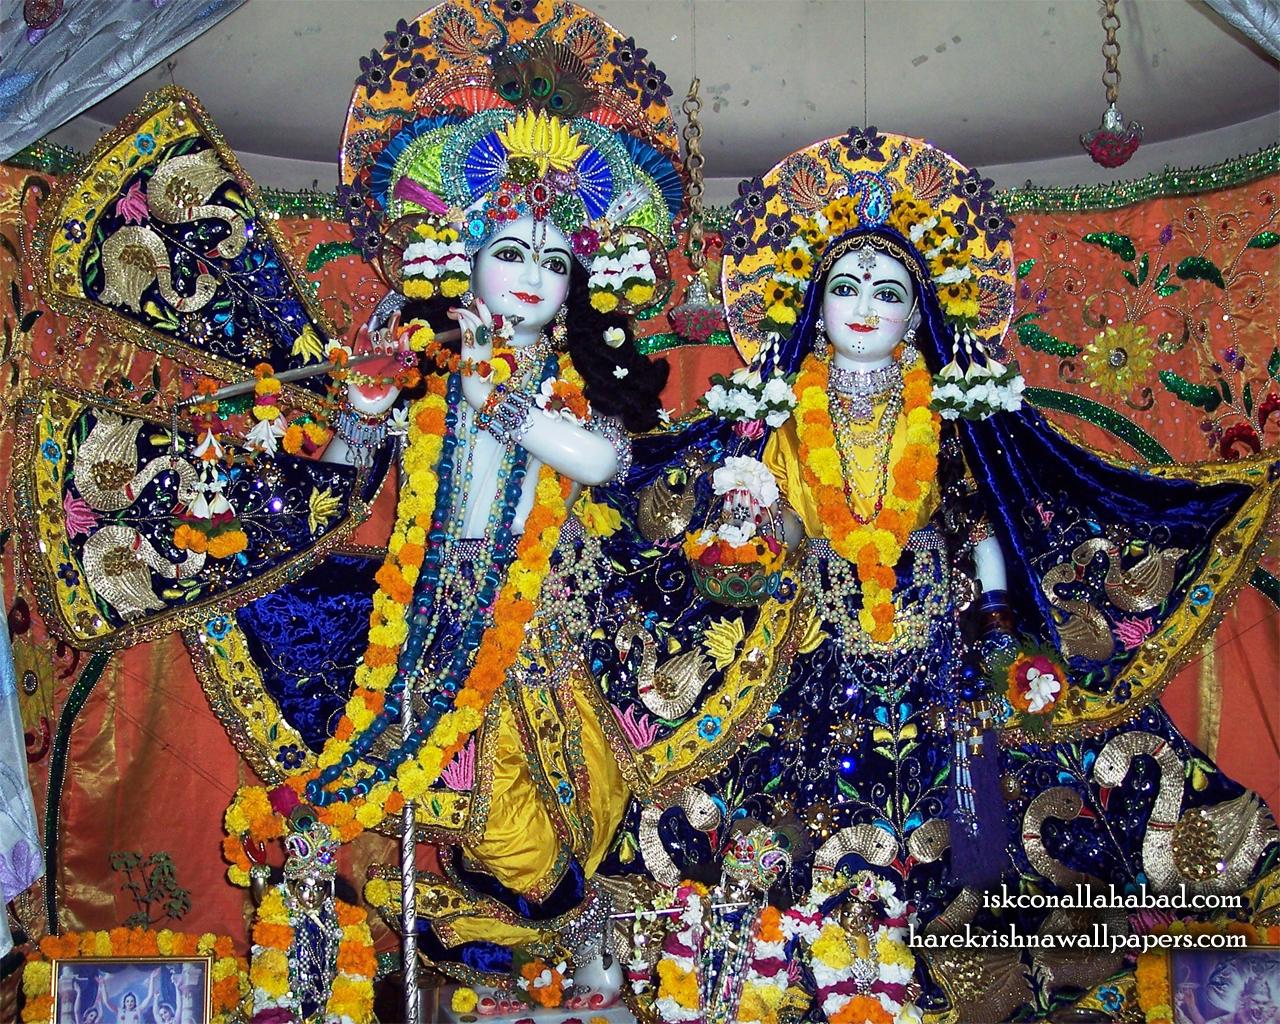 Sri Sri Radha Venimadhava Wallpaper (003) Size 1280x1024 Download